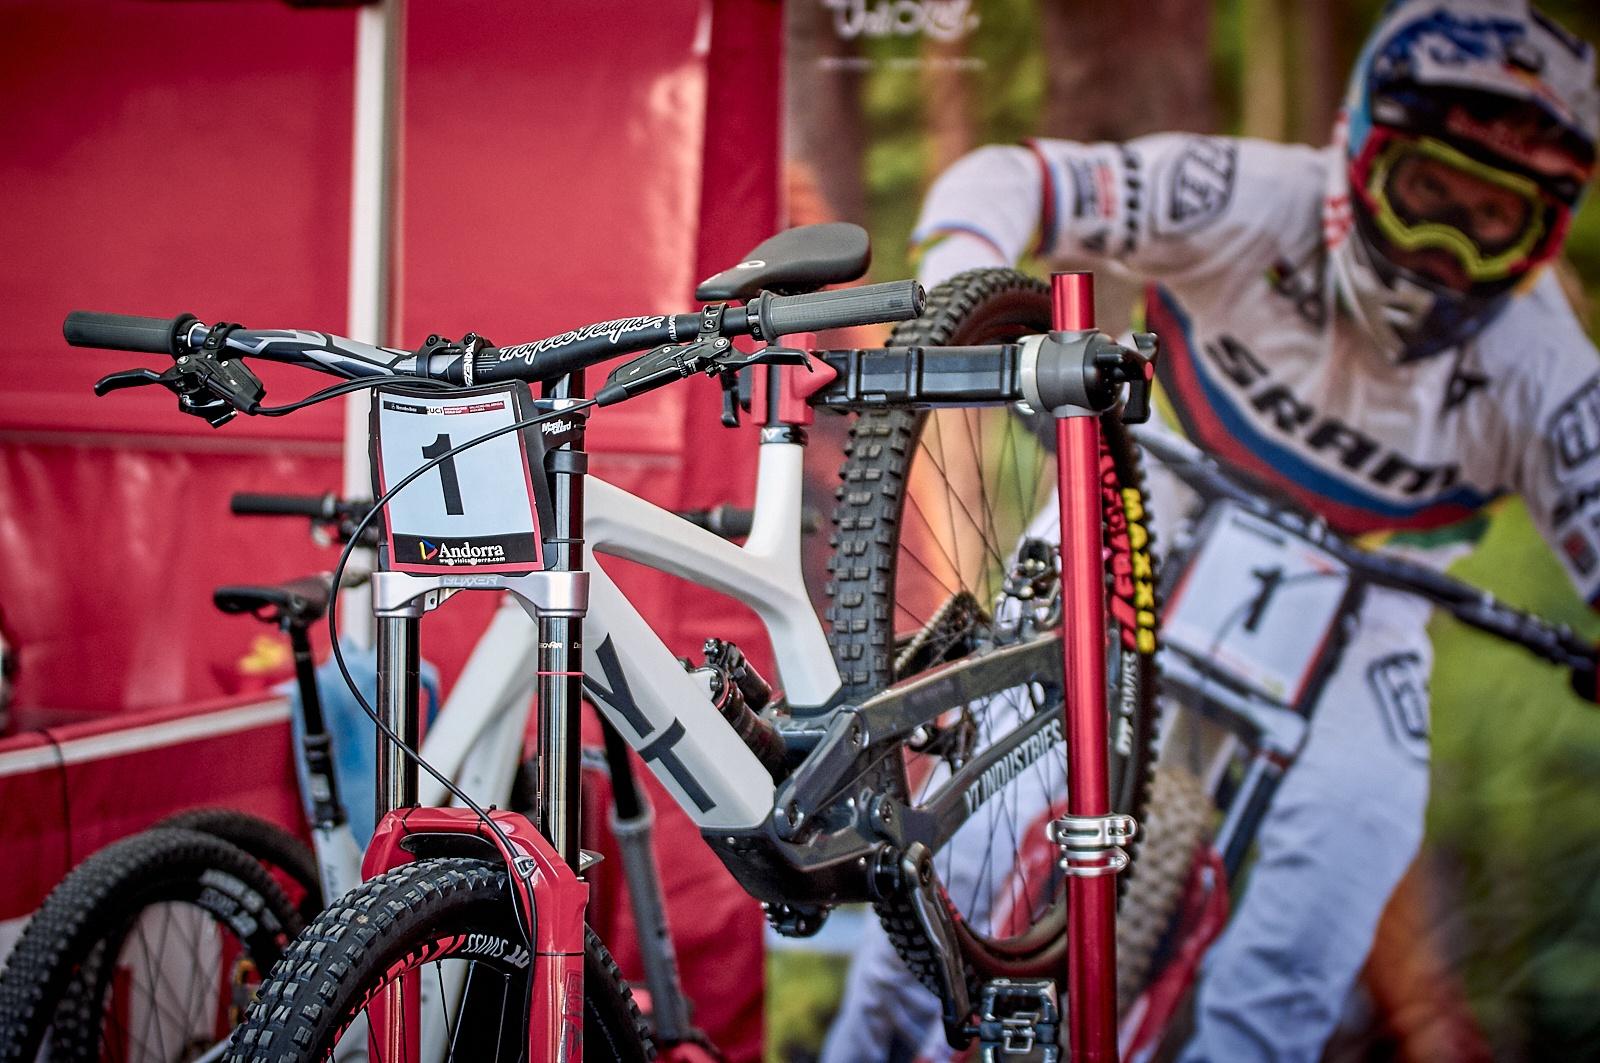 MTB - Downhill - Sergio Tomico, Photography